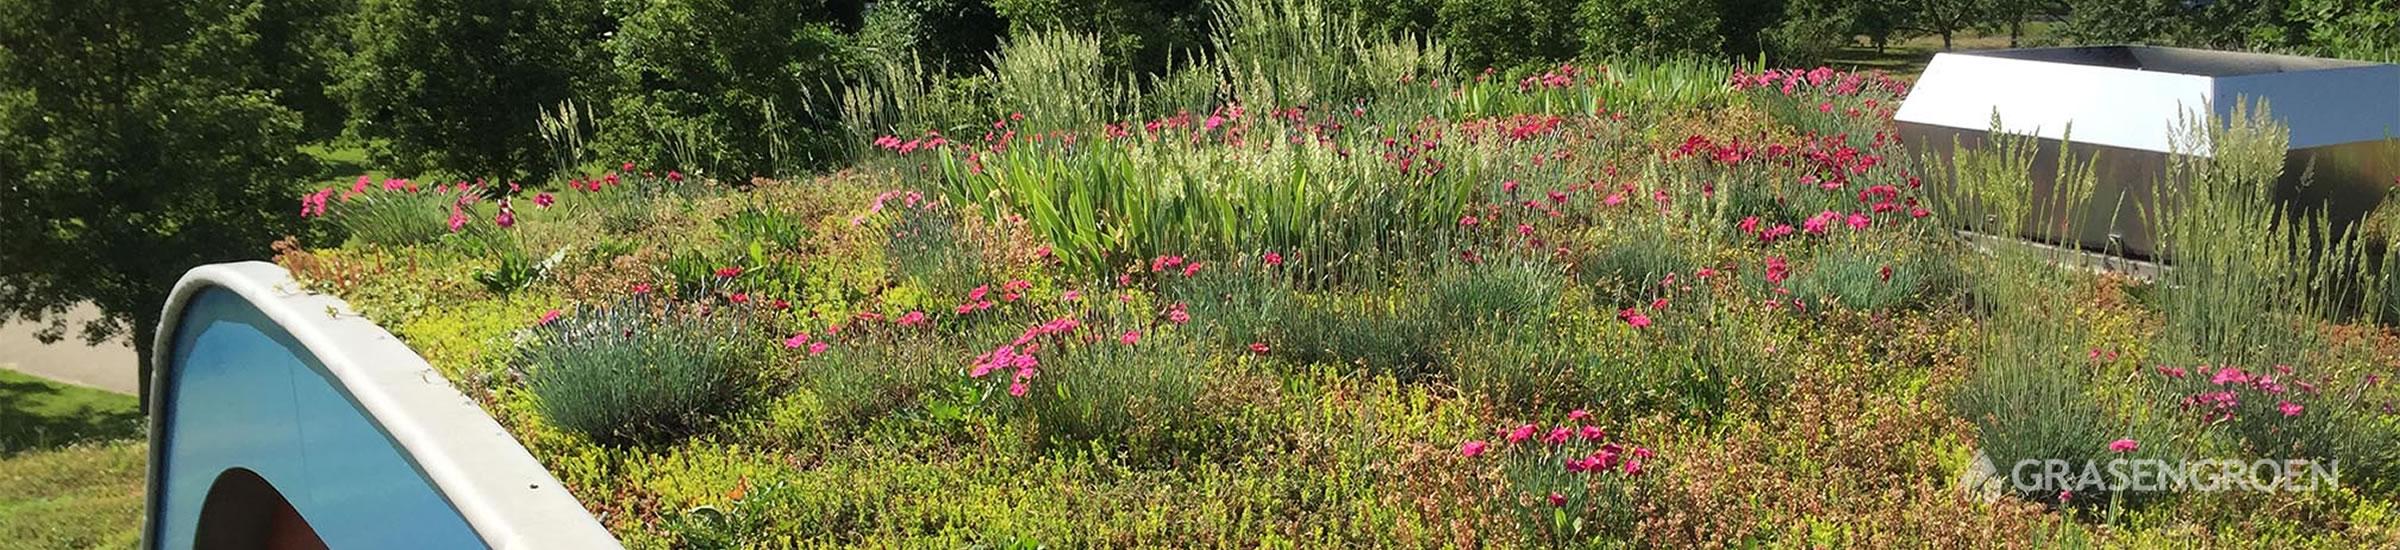 Adviessedumdak • Gras en Groen Winkel